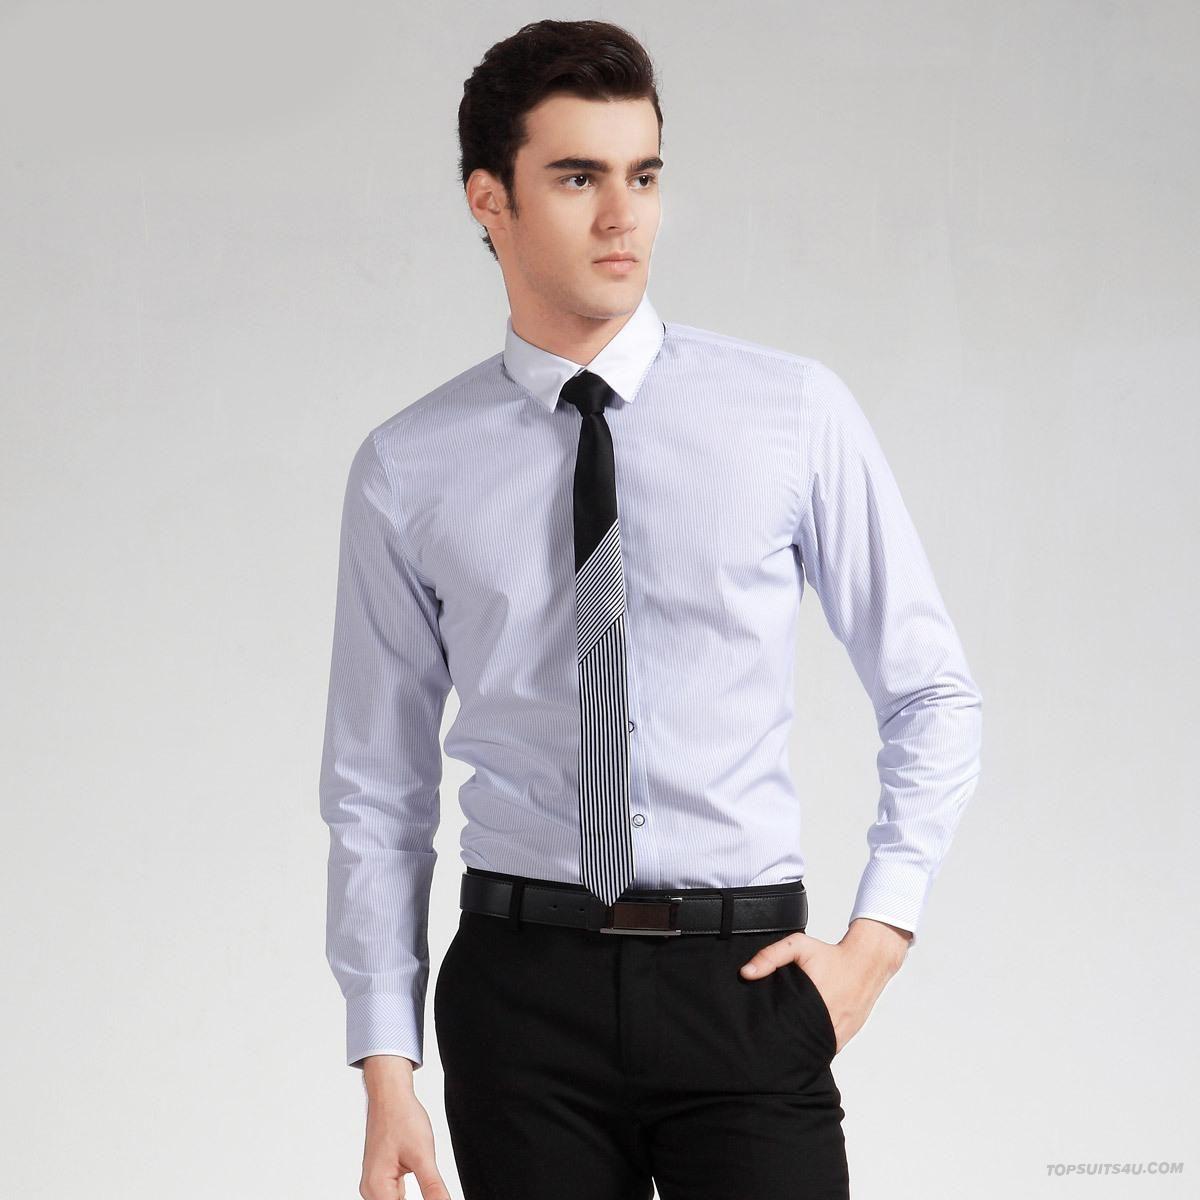 Dress Up Office Wear For Men Mens